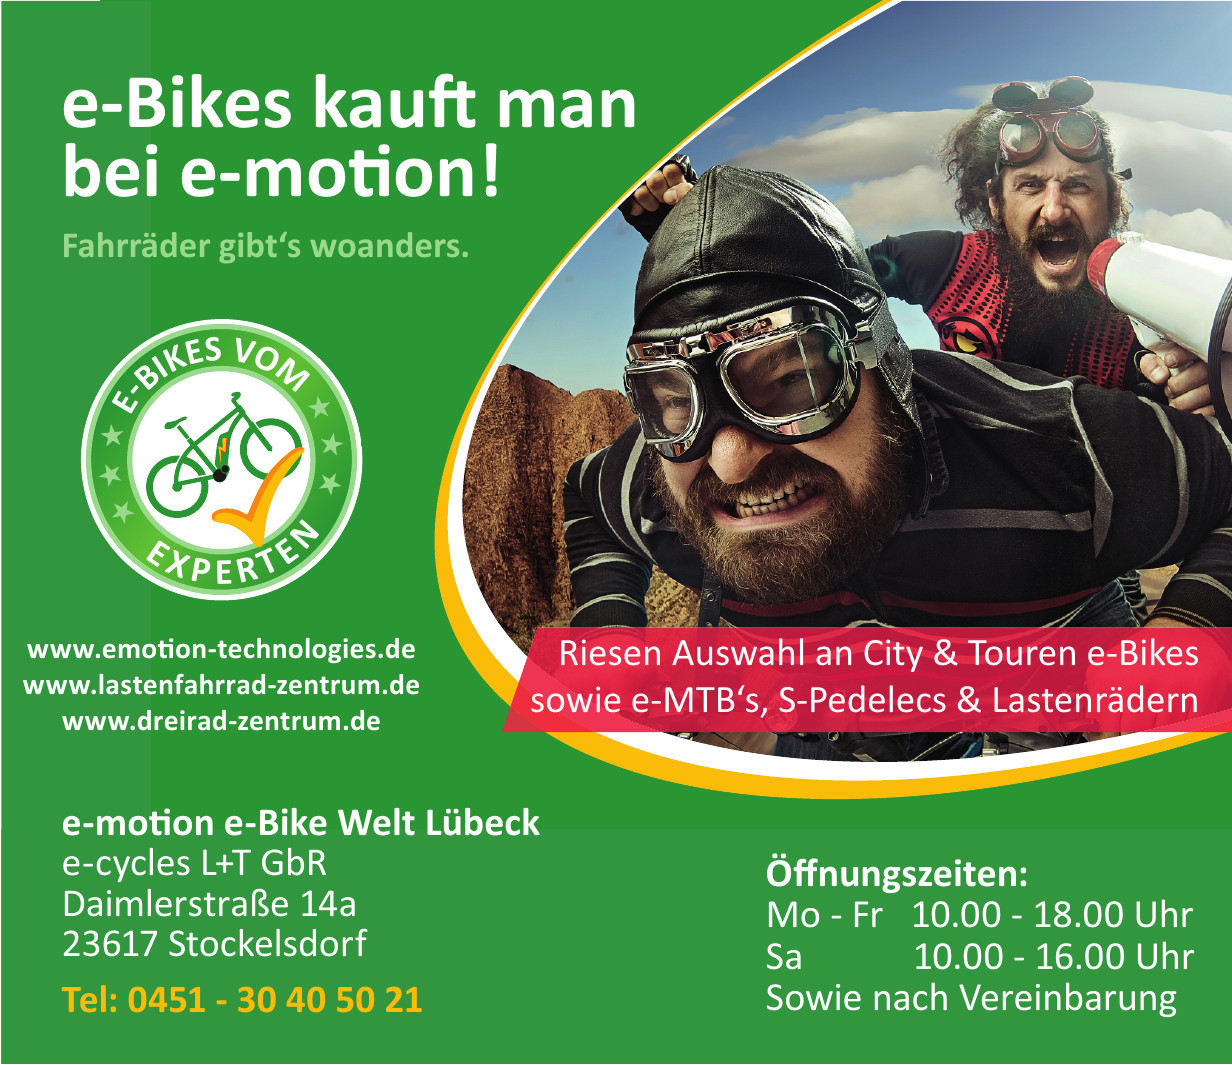 e-motion e-Bike Welt Lübeck e-cycles L+T GbR